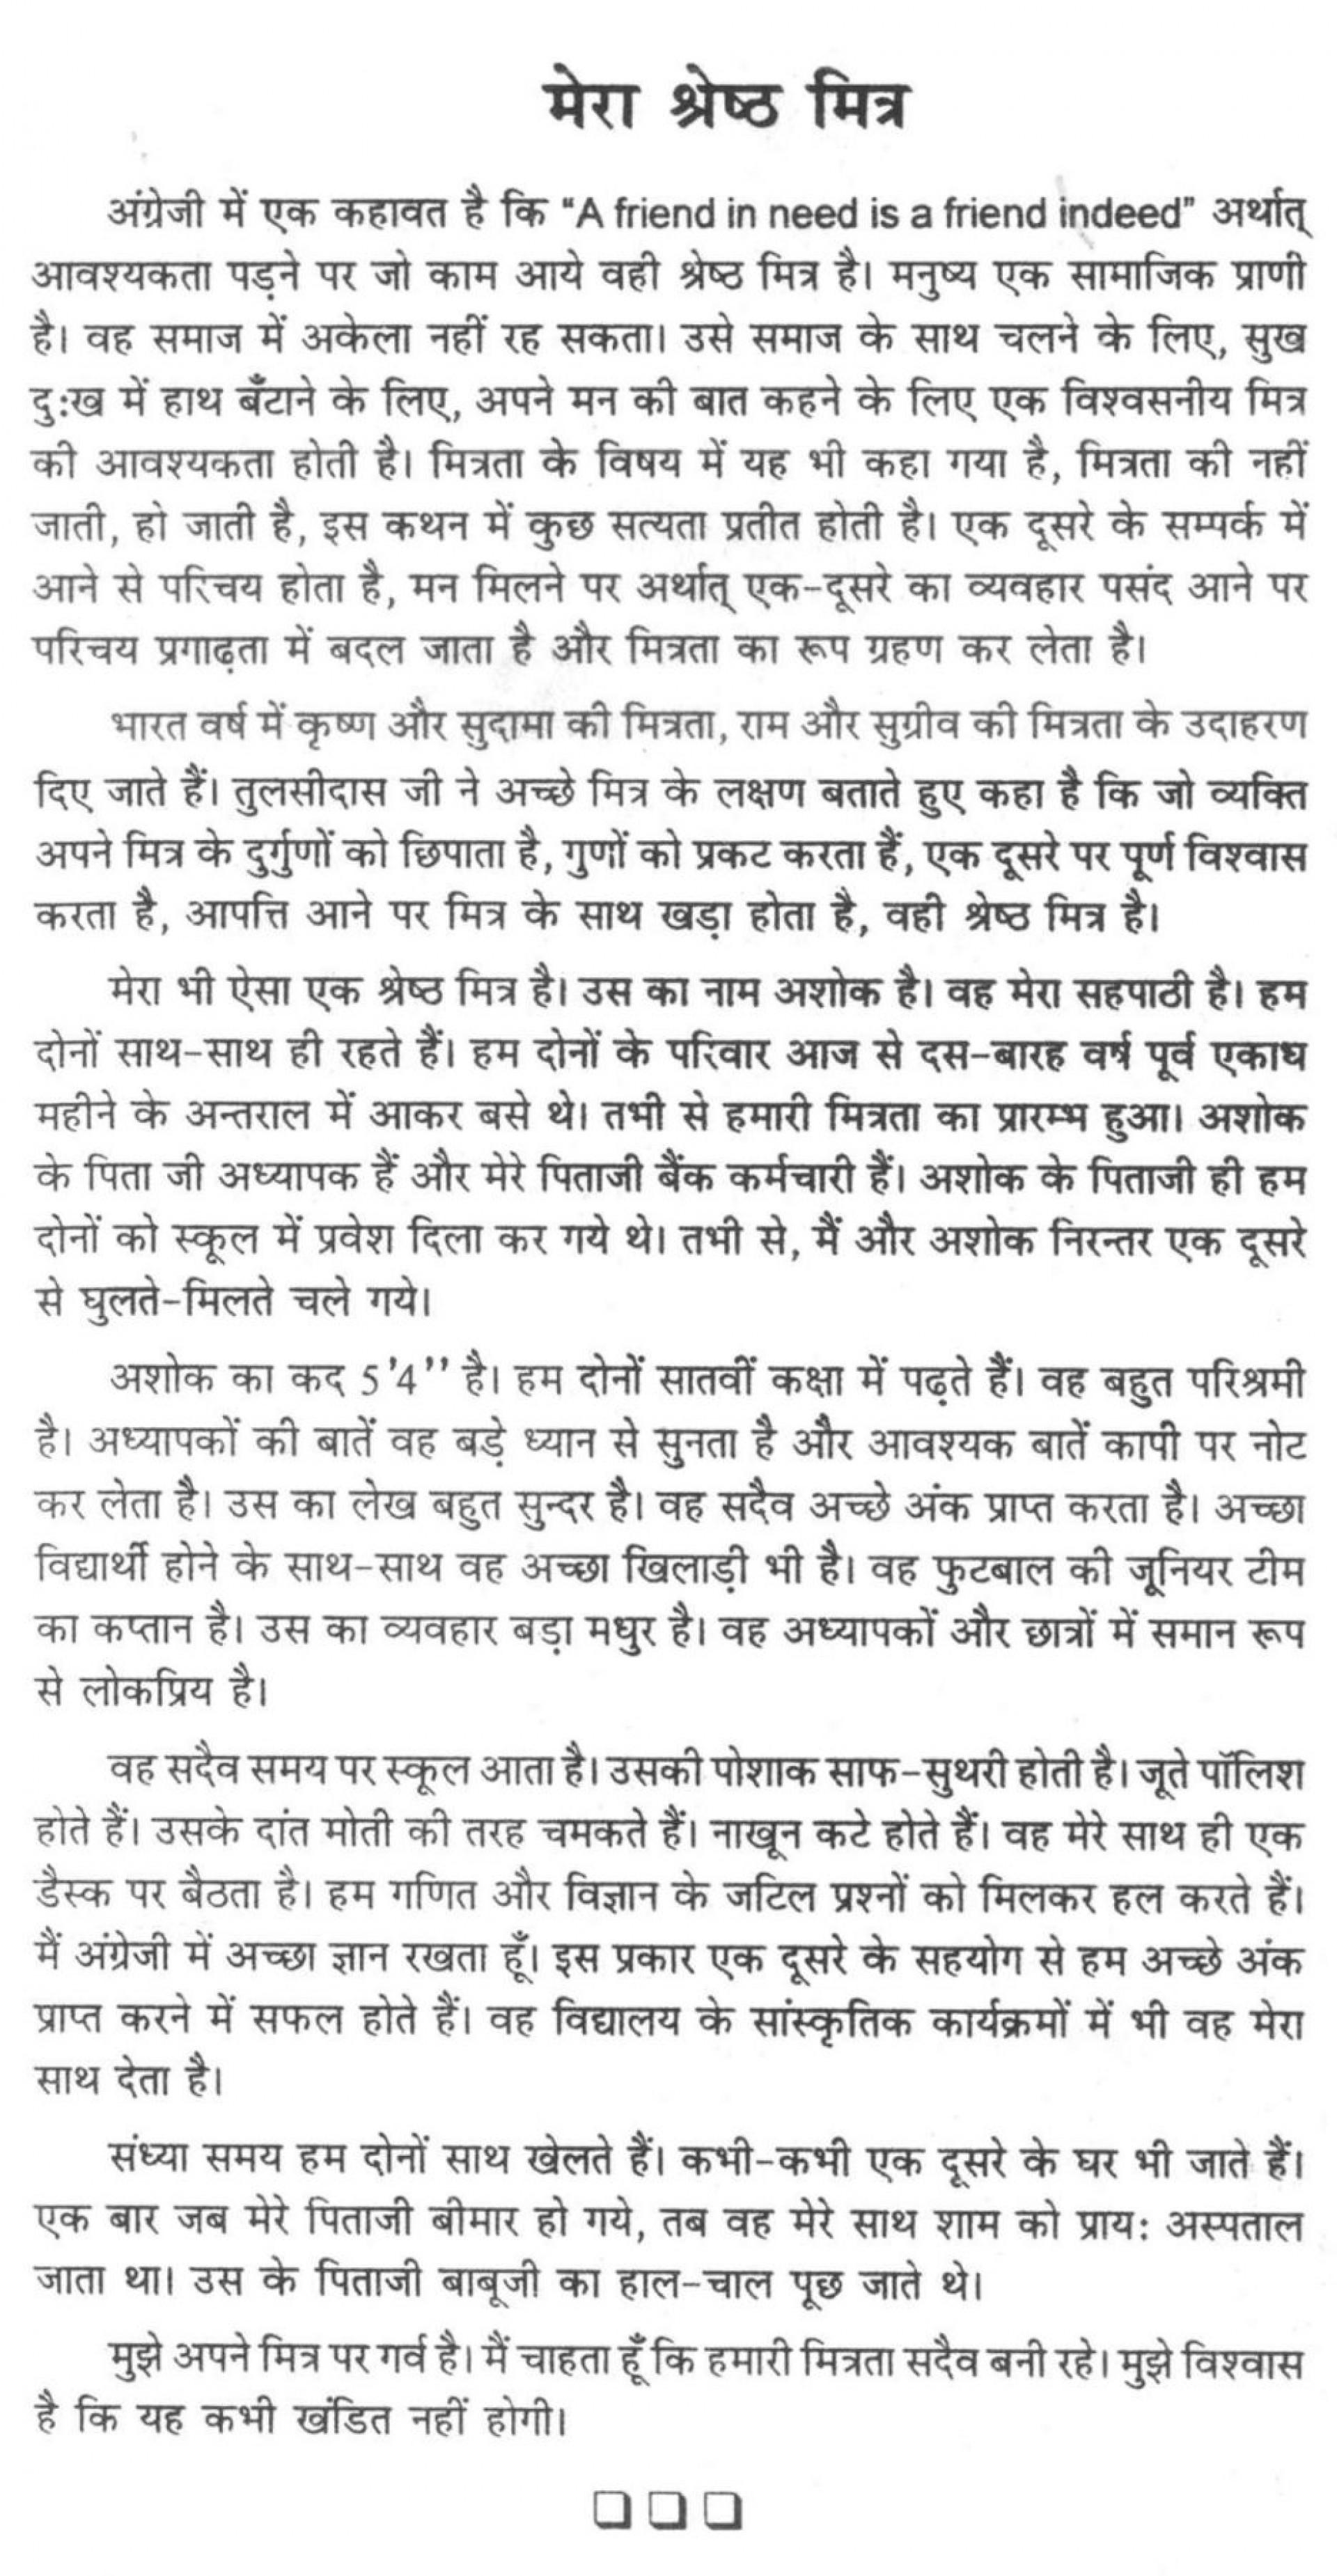 003 Essay Example Qualities Of Good Friends Friend Thumb Teacher Great Characteristics Pdf In Hindi Three Free Language Urdu Amazing A Conclusion Spm 1920